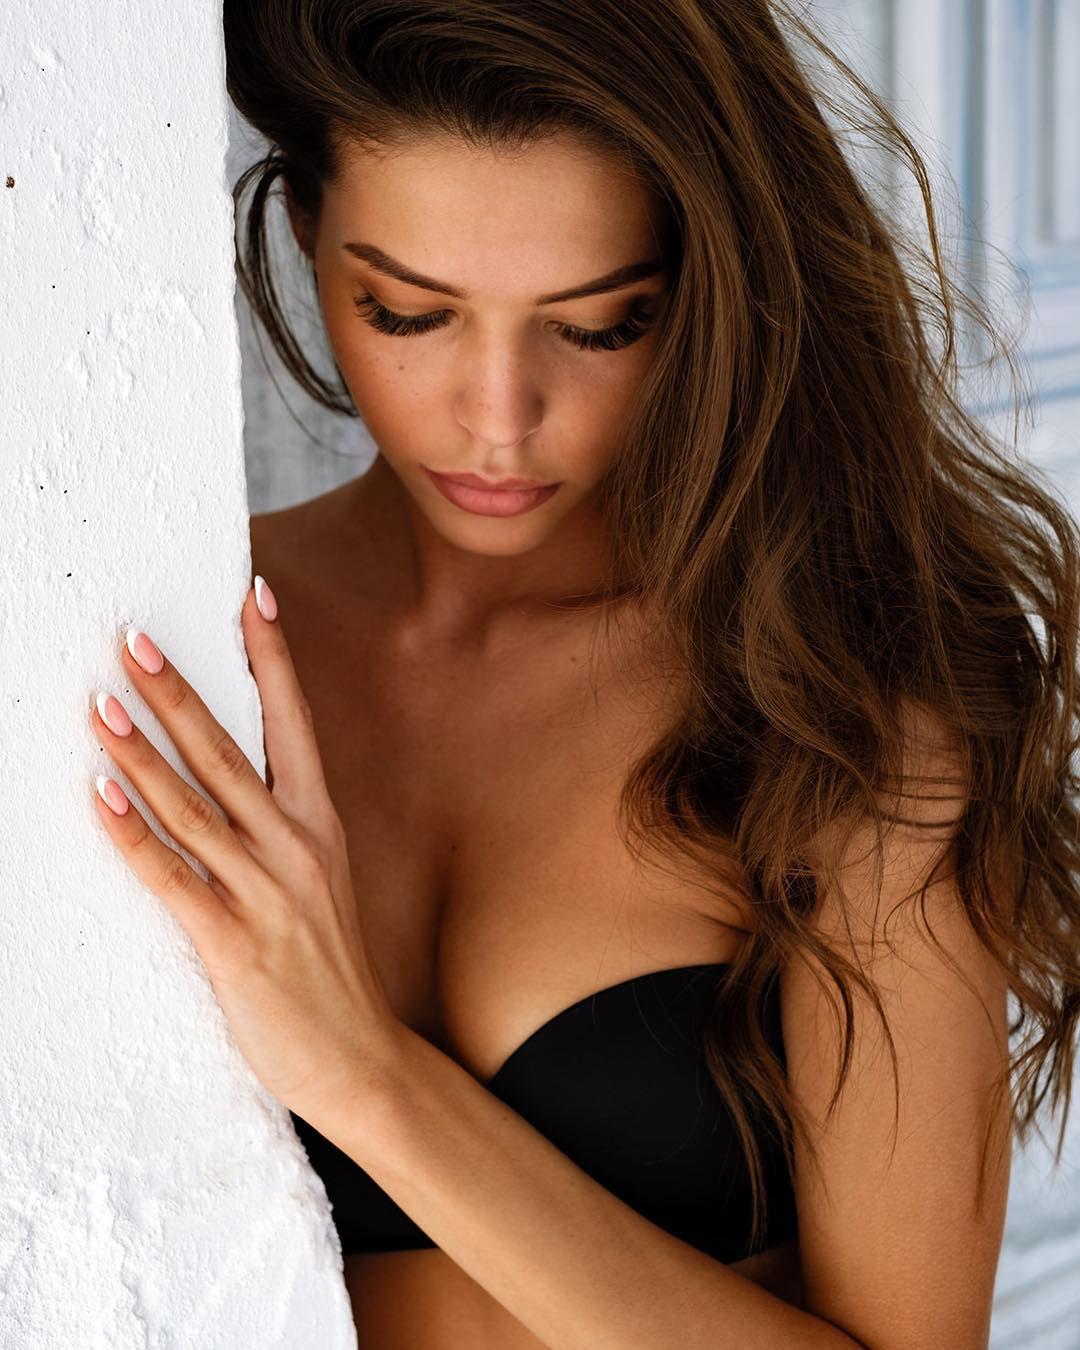 Fotos Katerina Sozinova nudes (41 photos), Tits, Bikini, Twitter, cleavage 2015